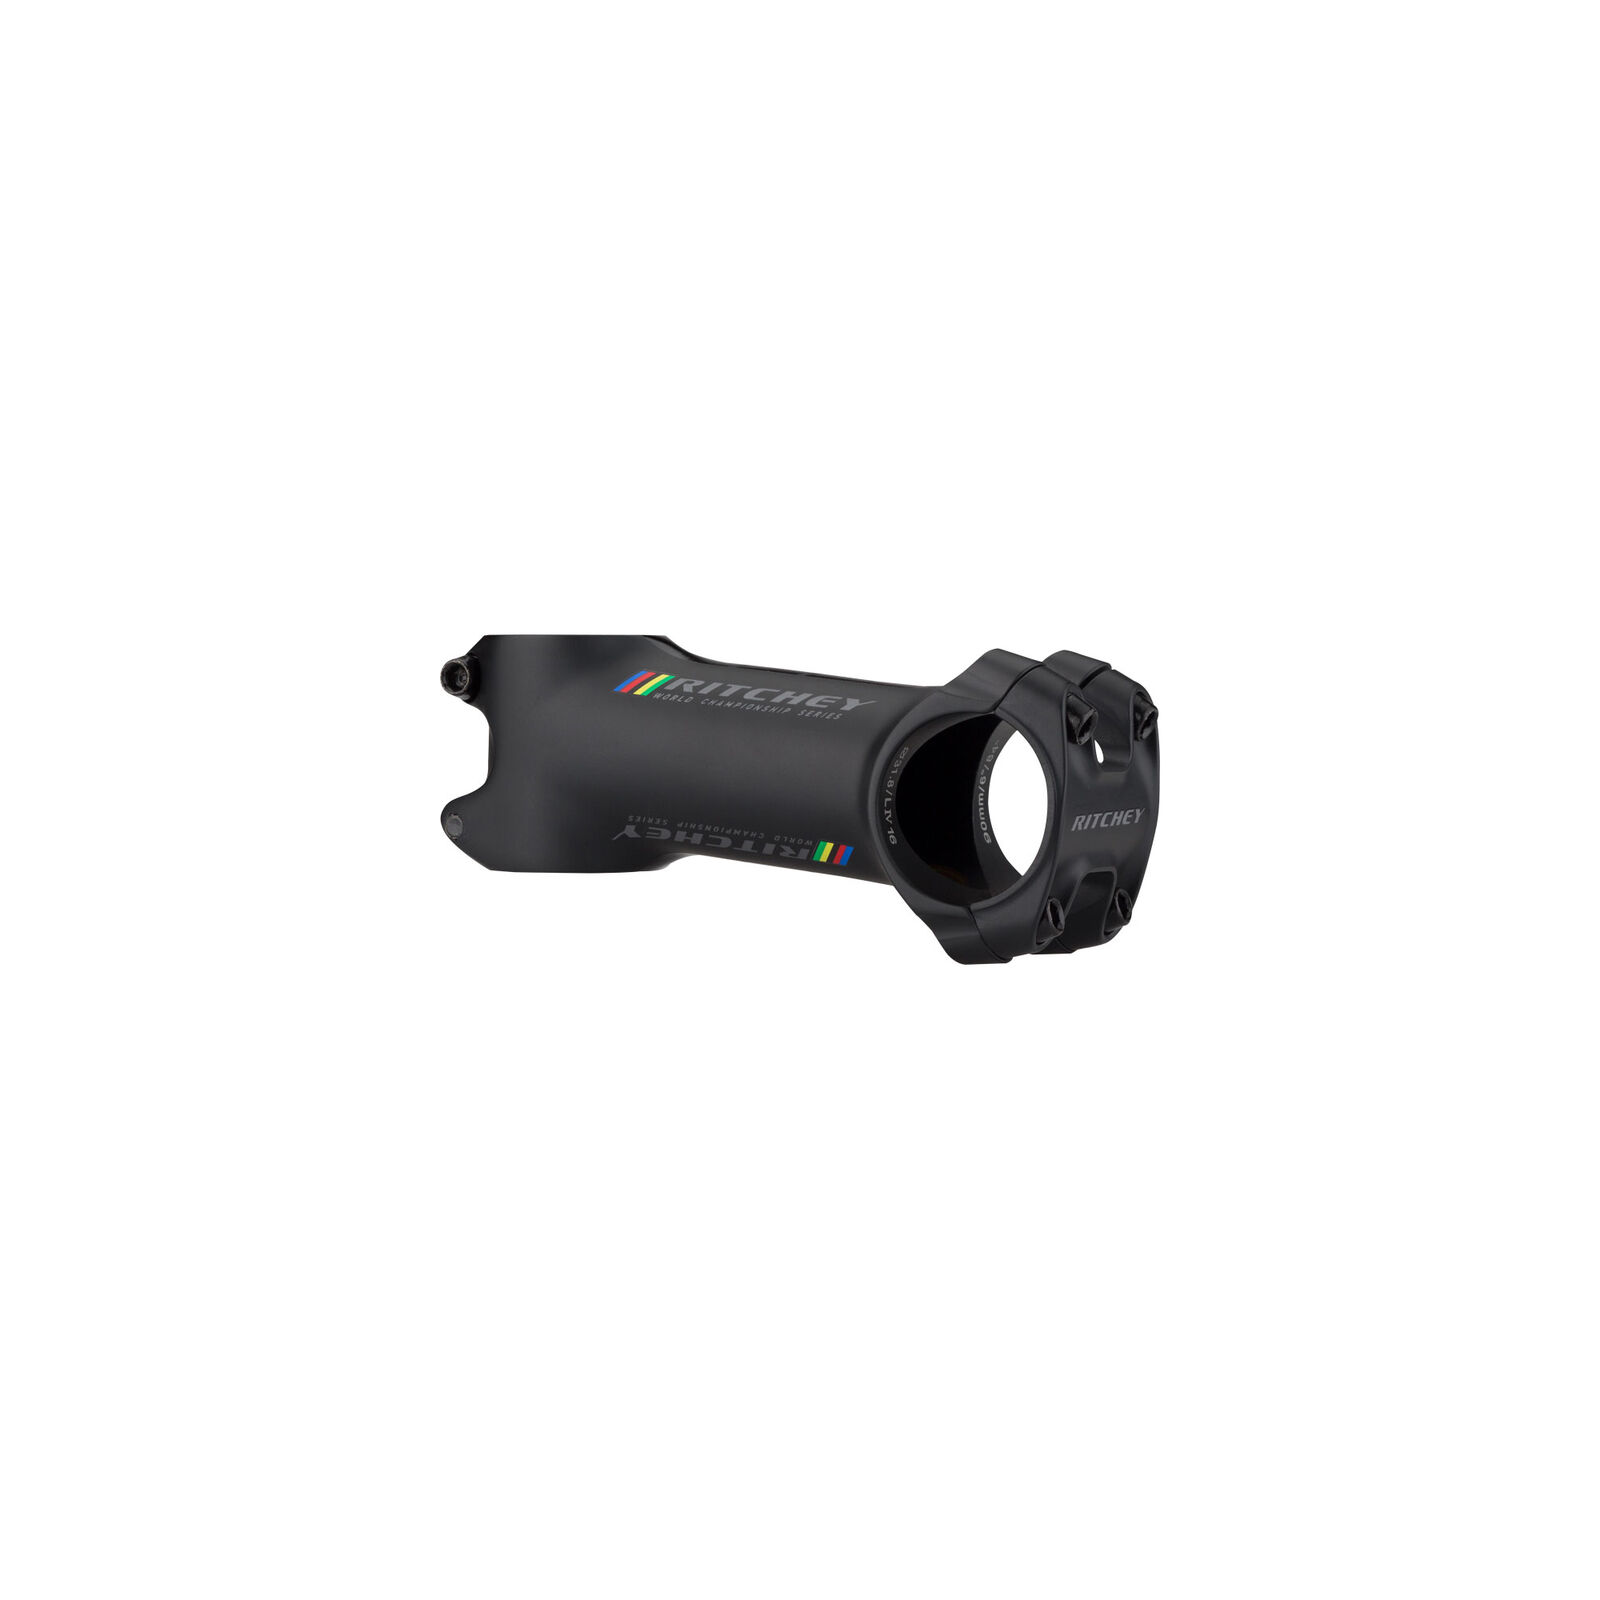 Ritchey WCS C220 84D  Stem  90mm, + - 6, 31.8, 1-1 8, Blatte   cheapest price